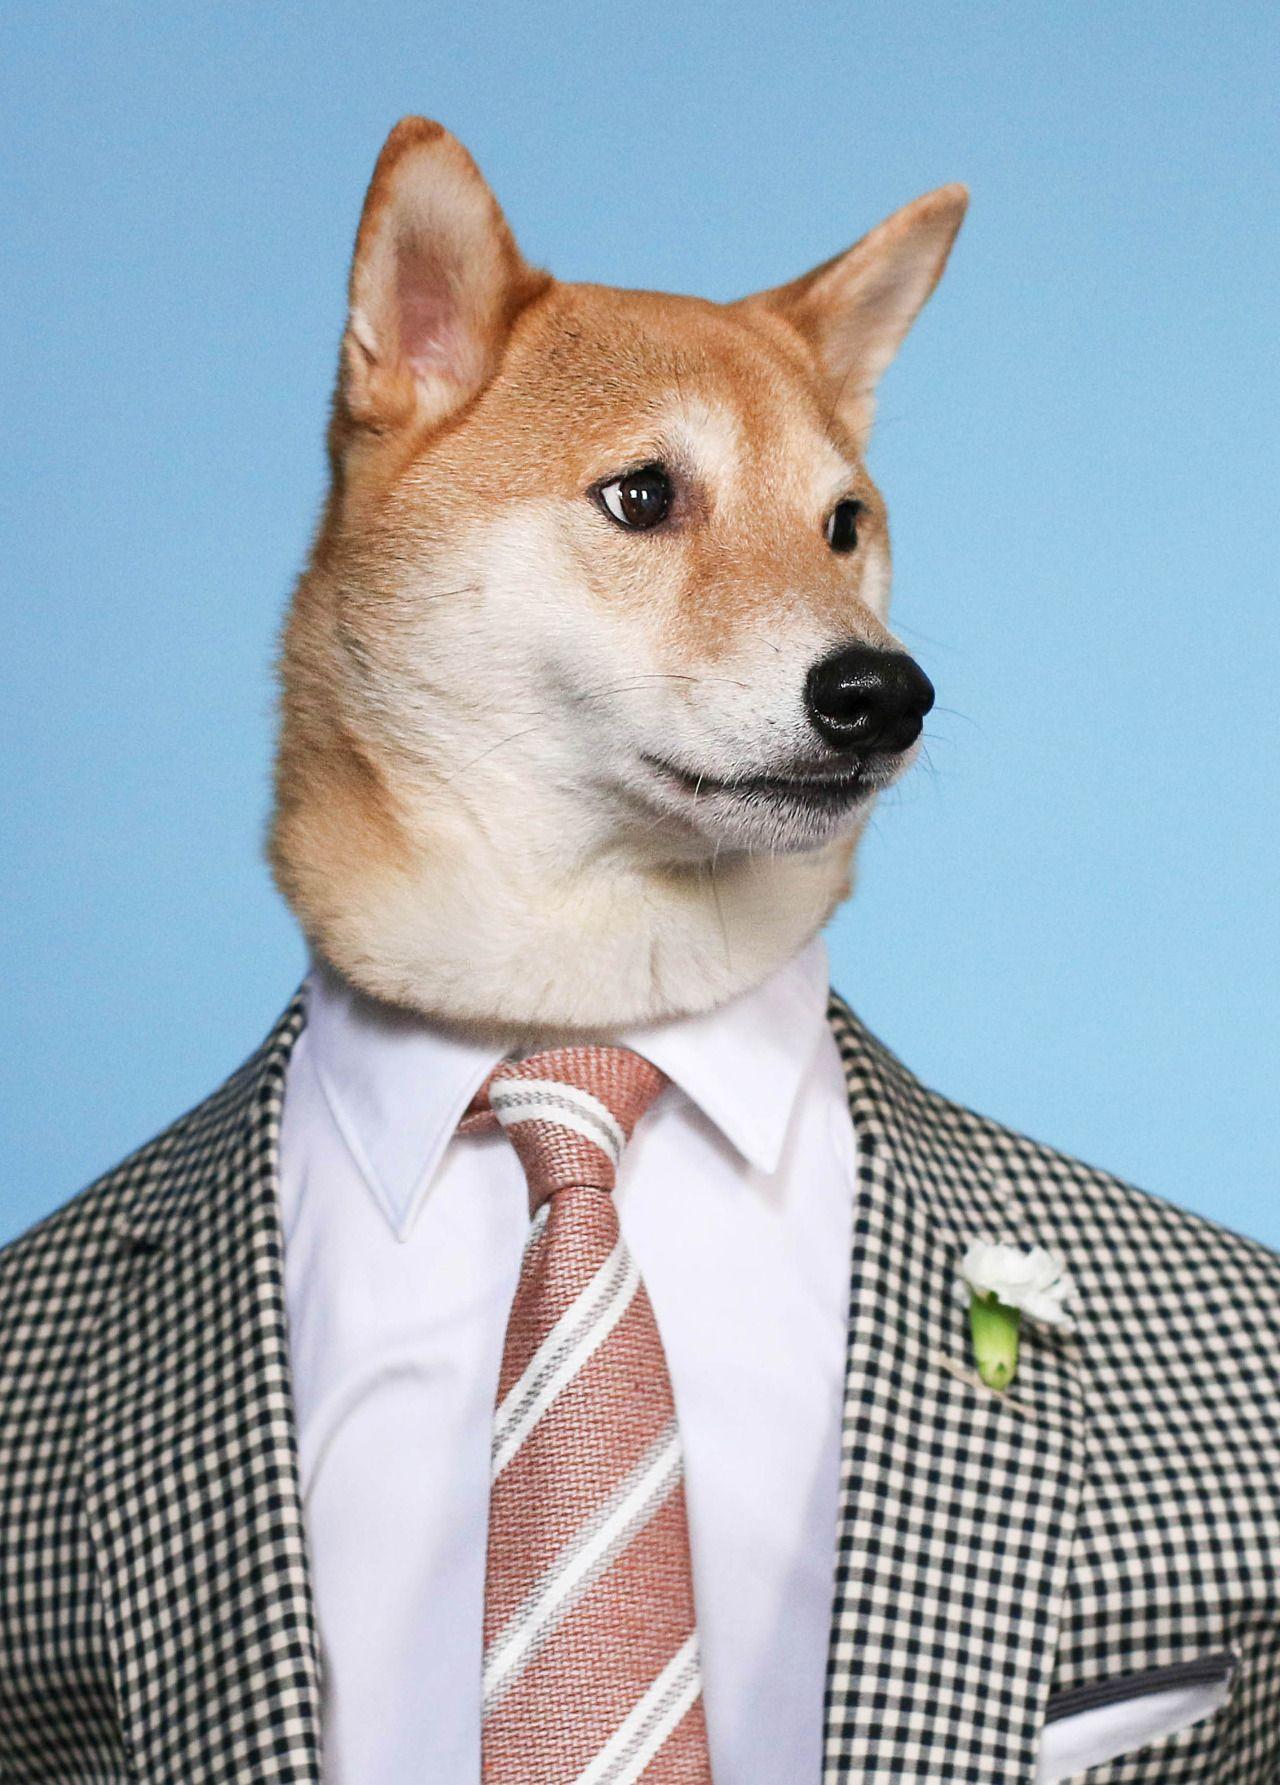 Mensweardog Menswear Dog Dog Clothes Dogs